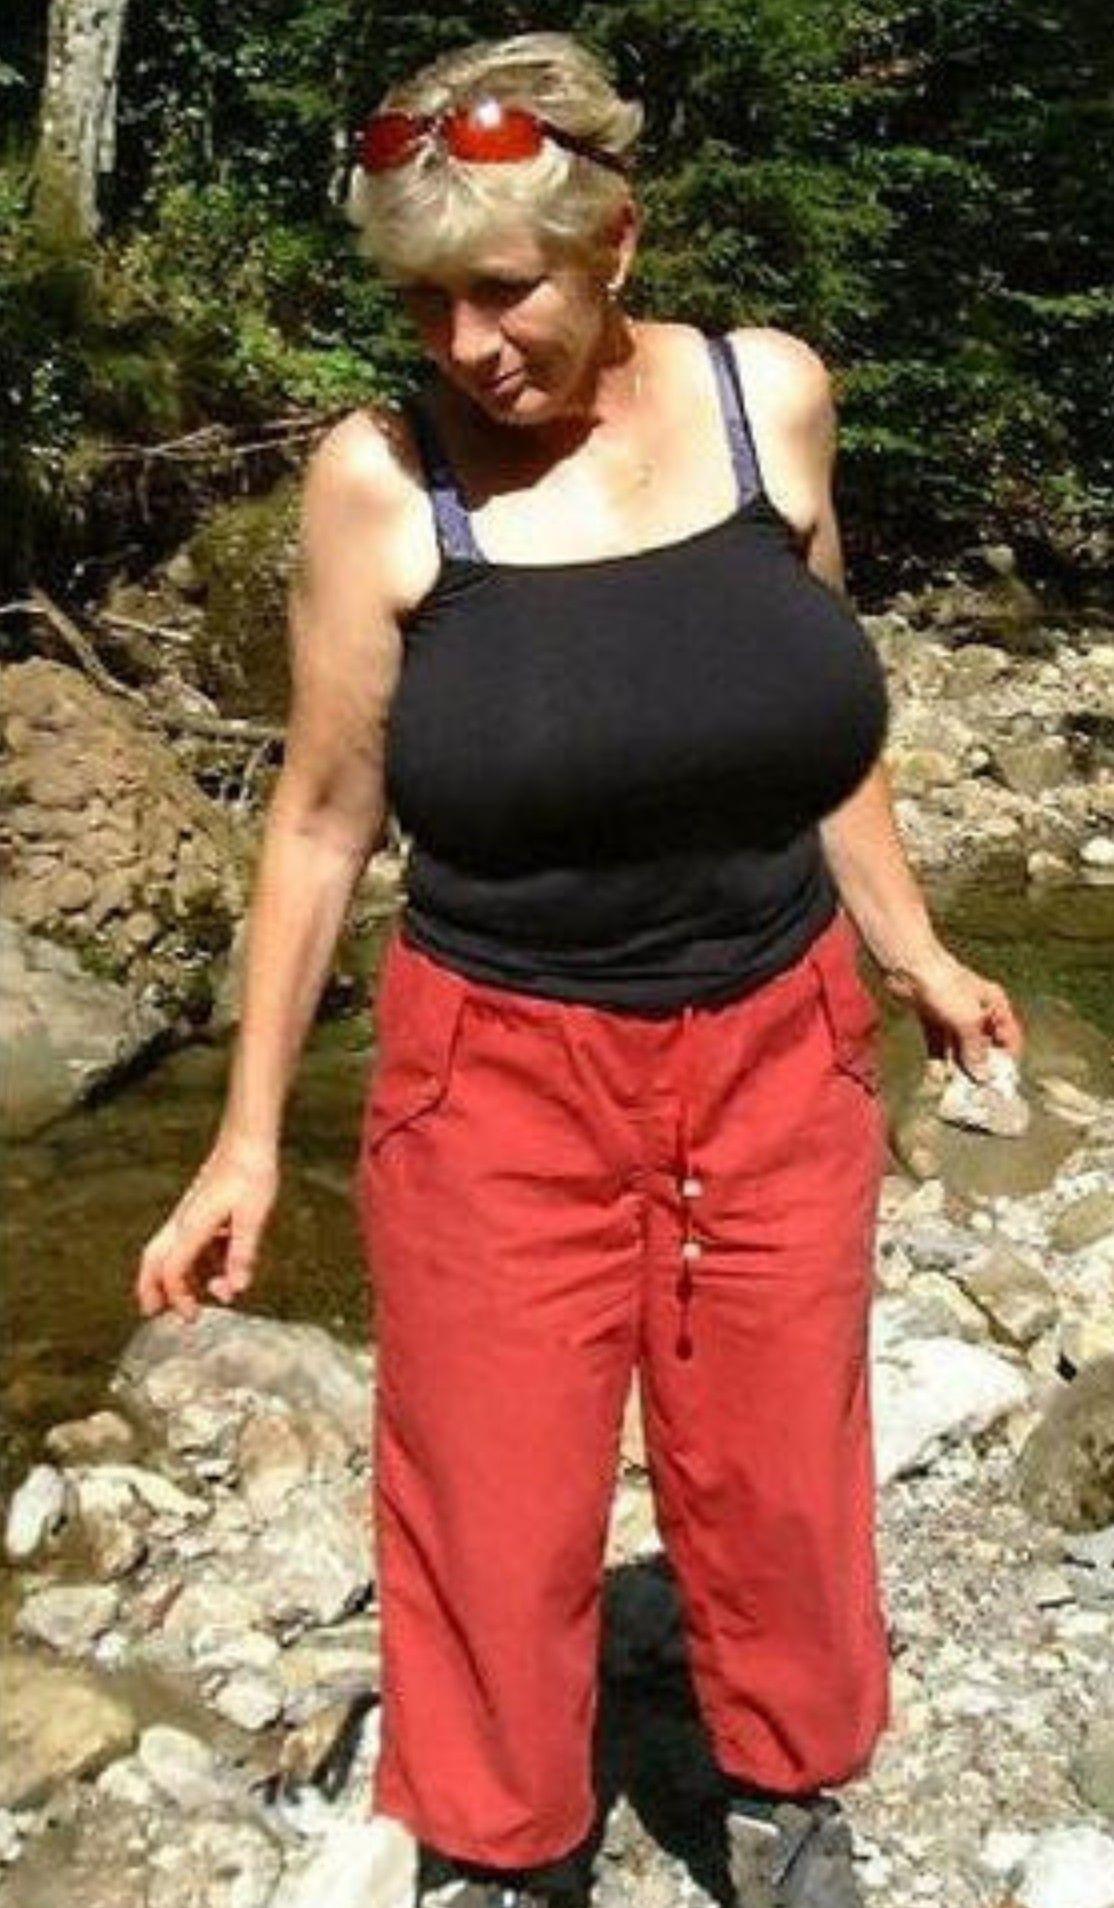 Pin by Debbie on greta guugili in 2021 | Pants, Parachute